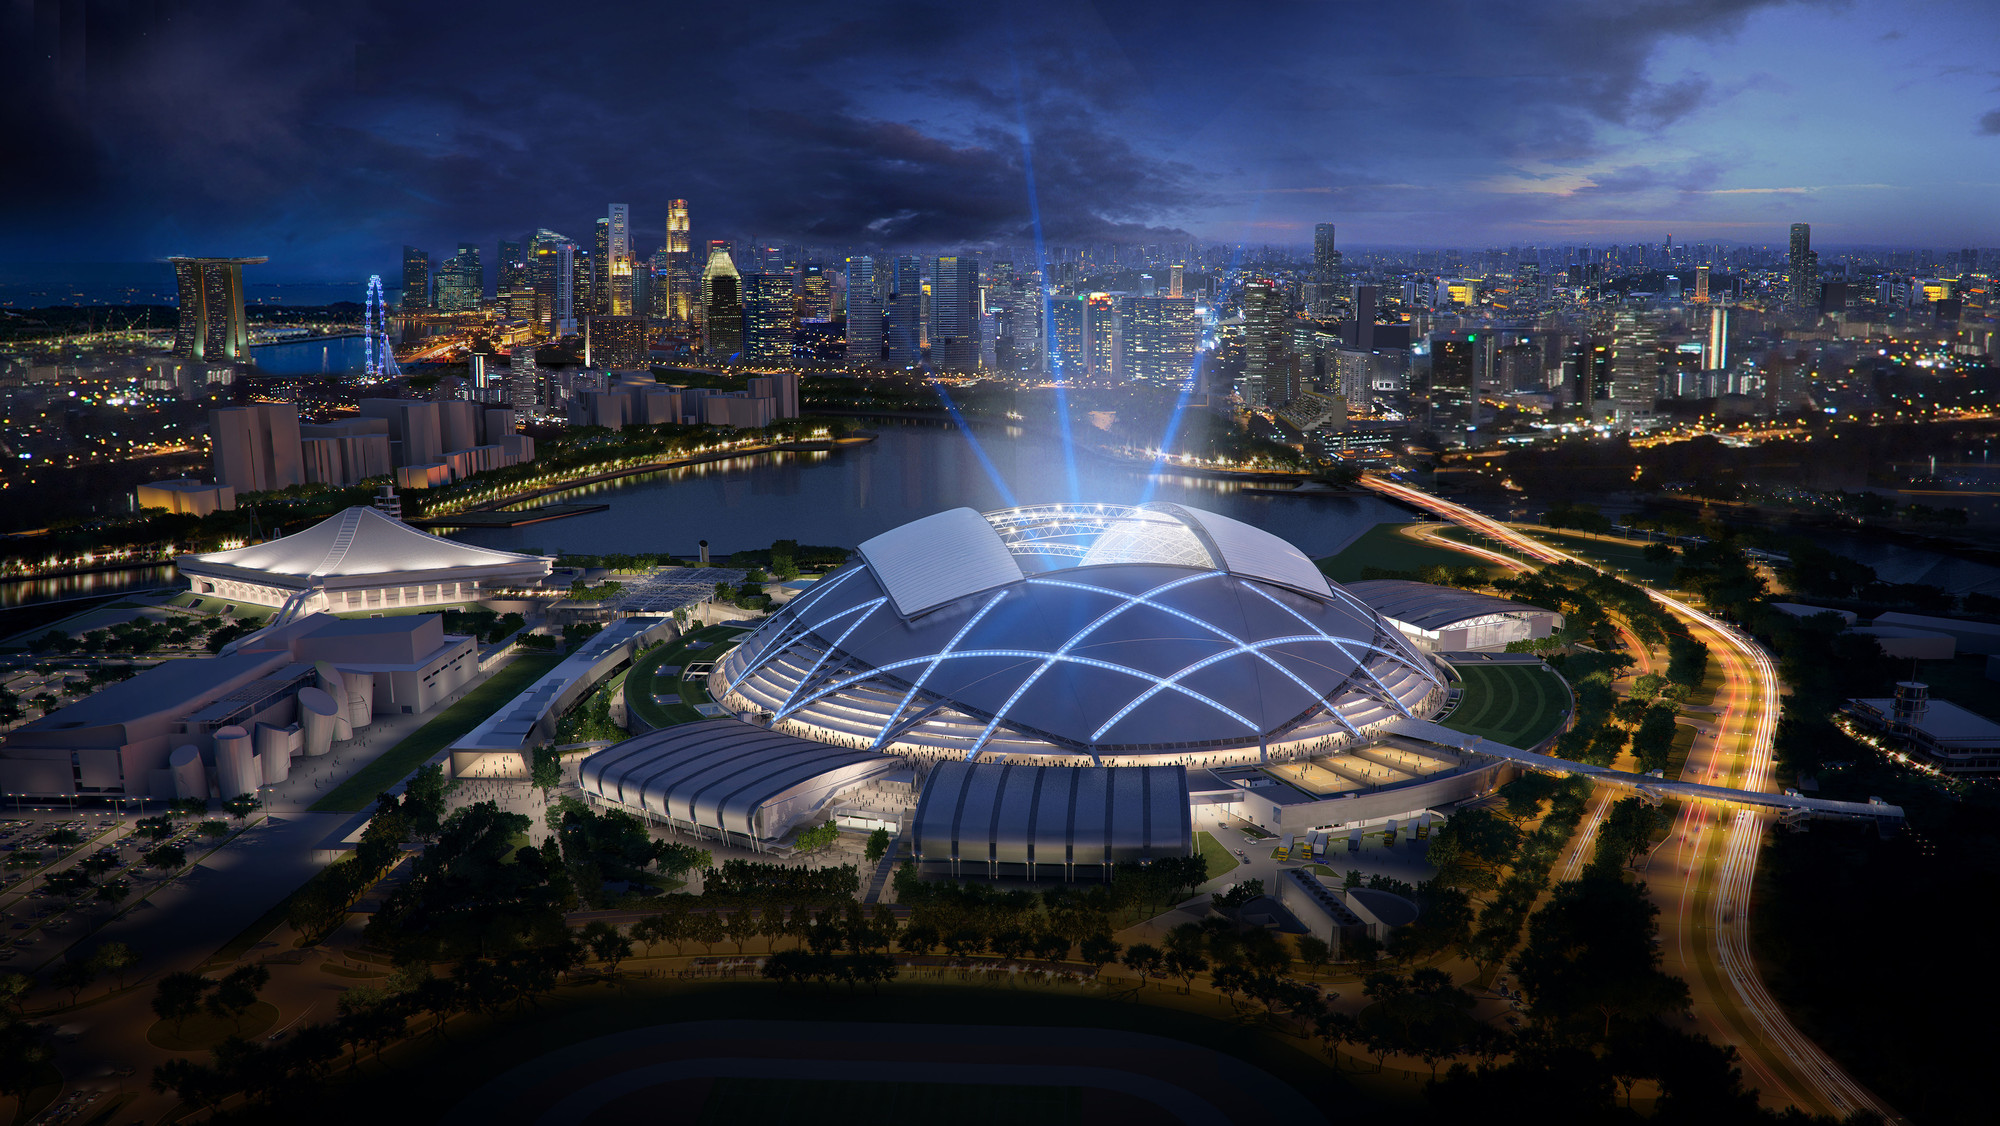 Future projects leisure-led development winner: Singapore Sports Hub by Singapore Sports Hub Design